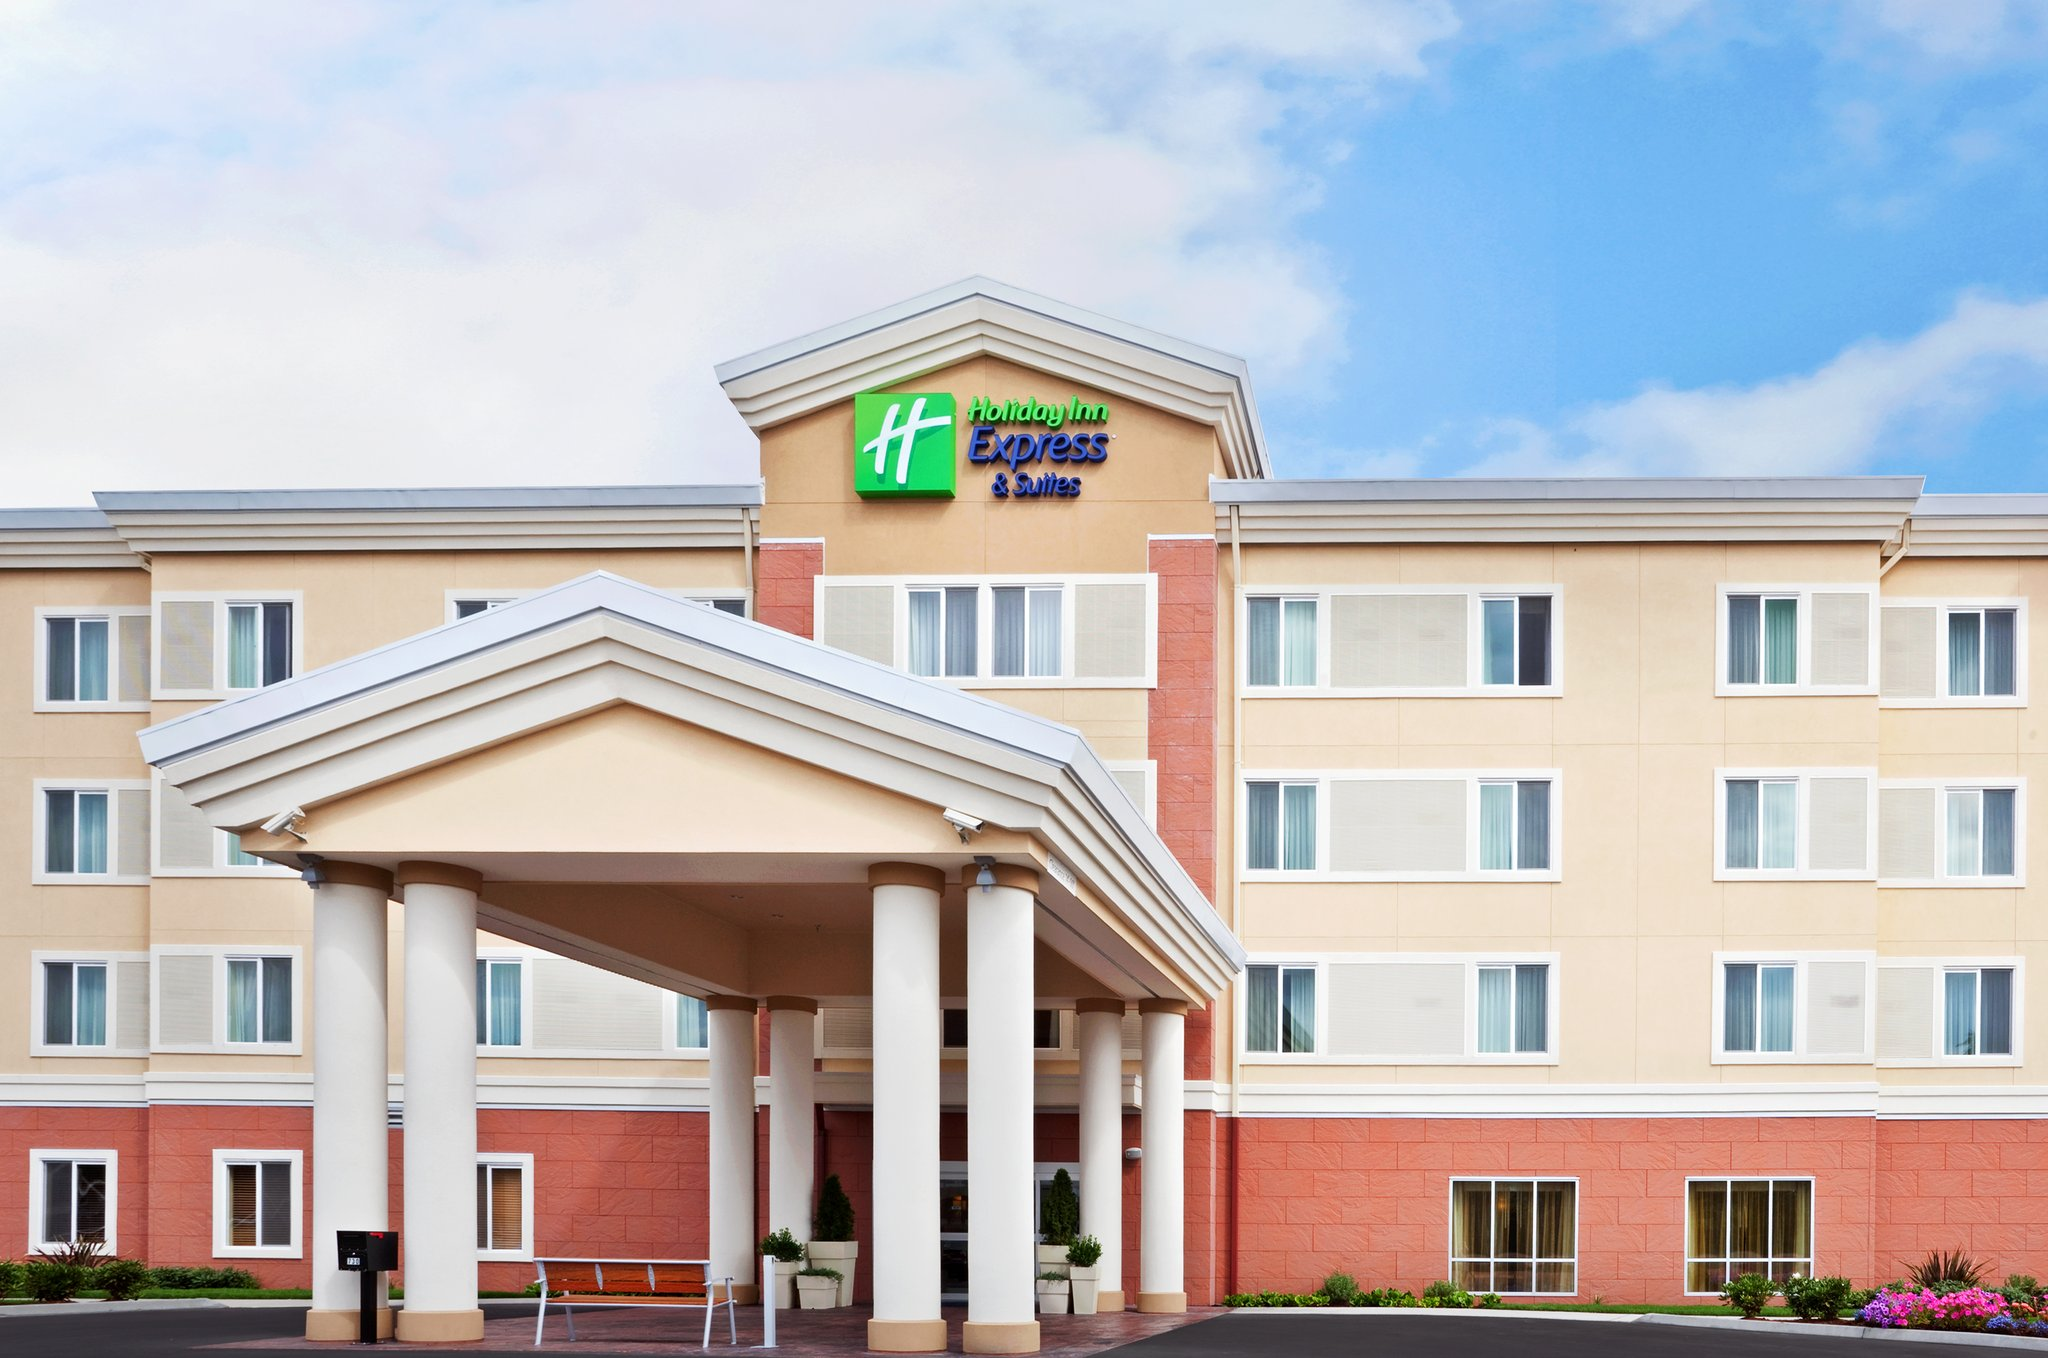 Holiday Inn Express & Suites Chehalis